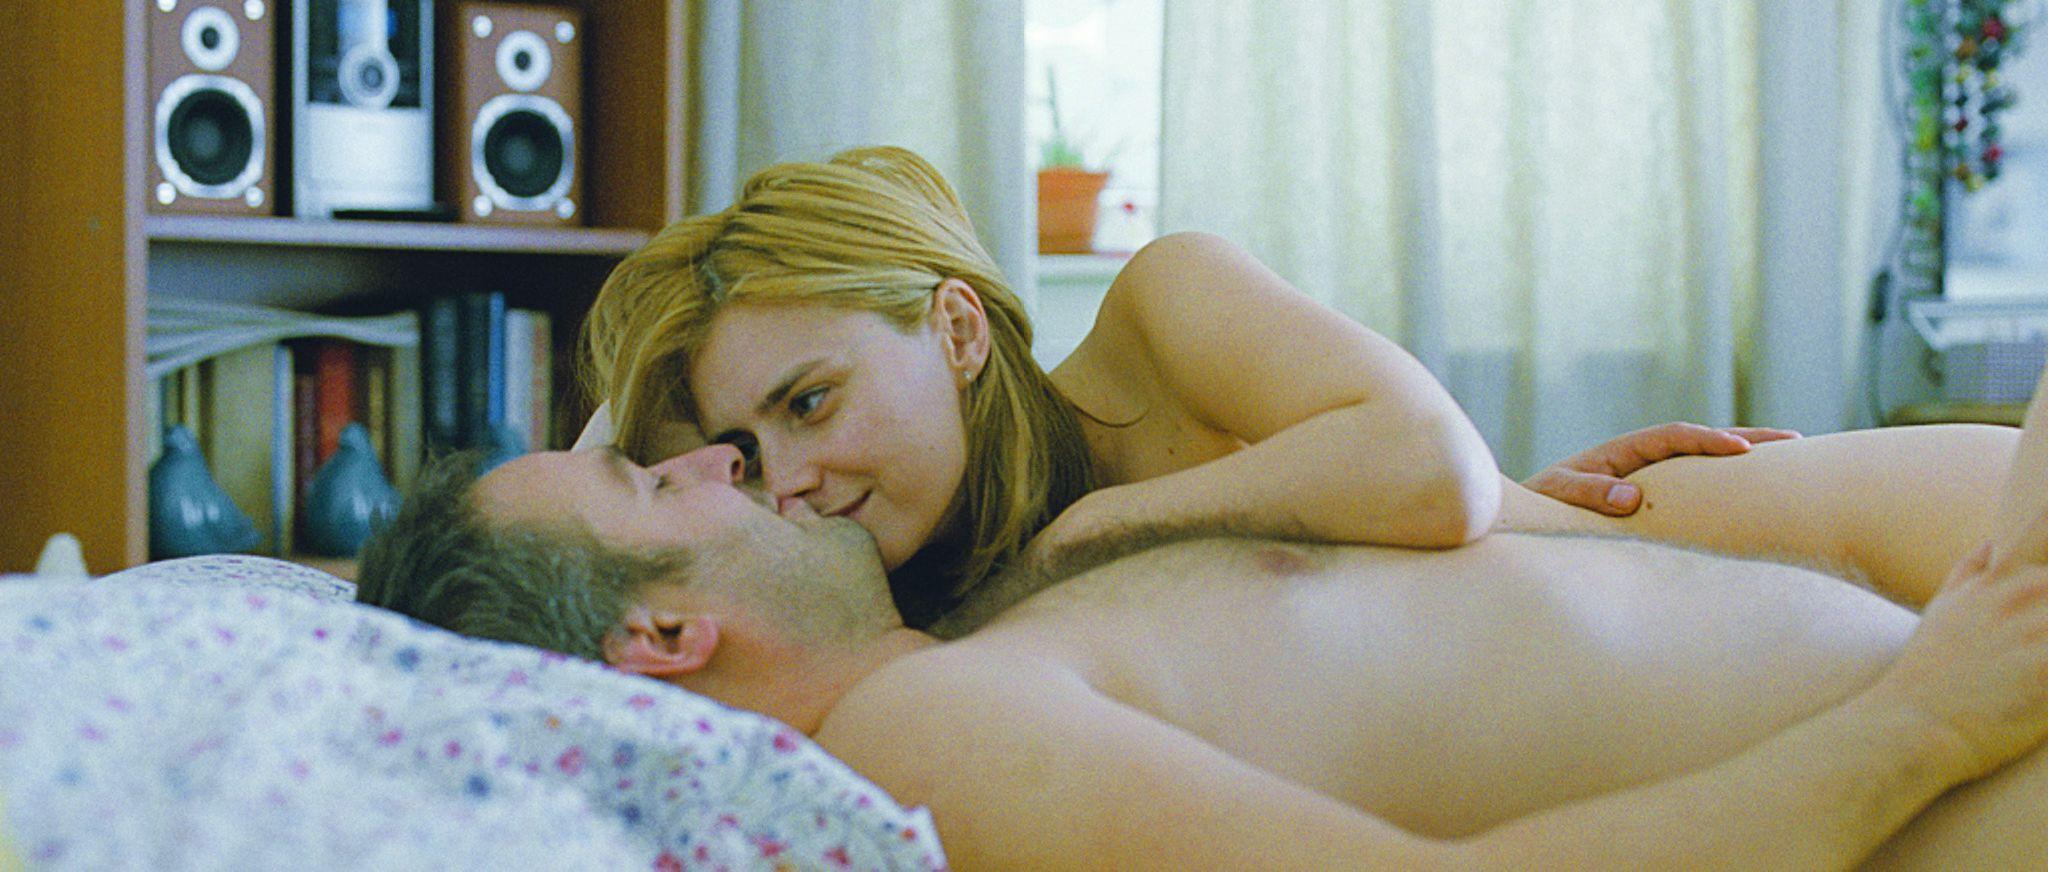 Erotic Movies Watch